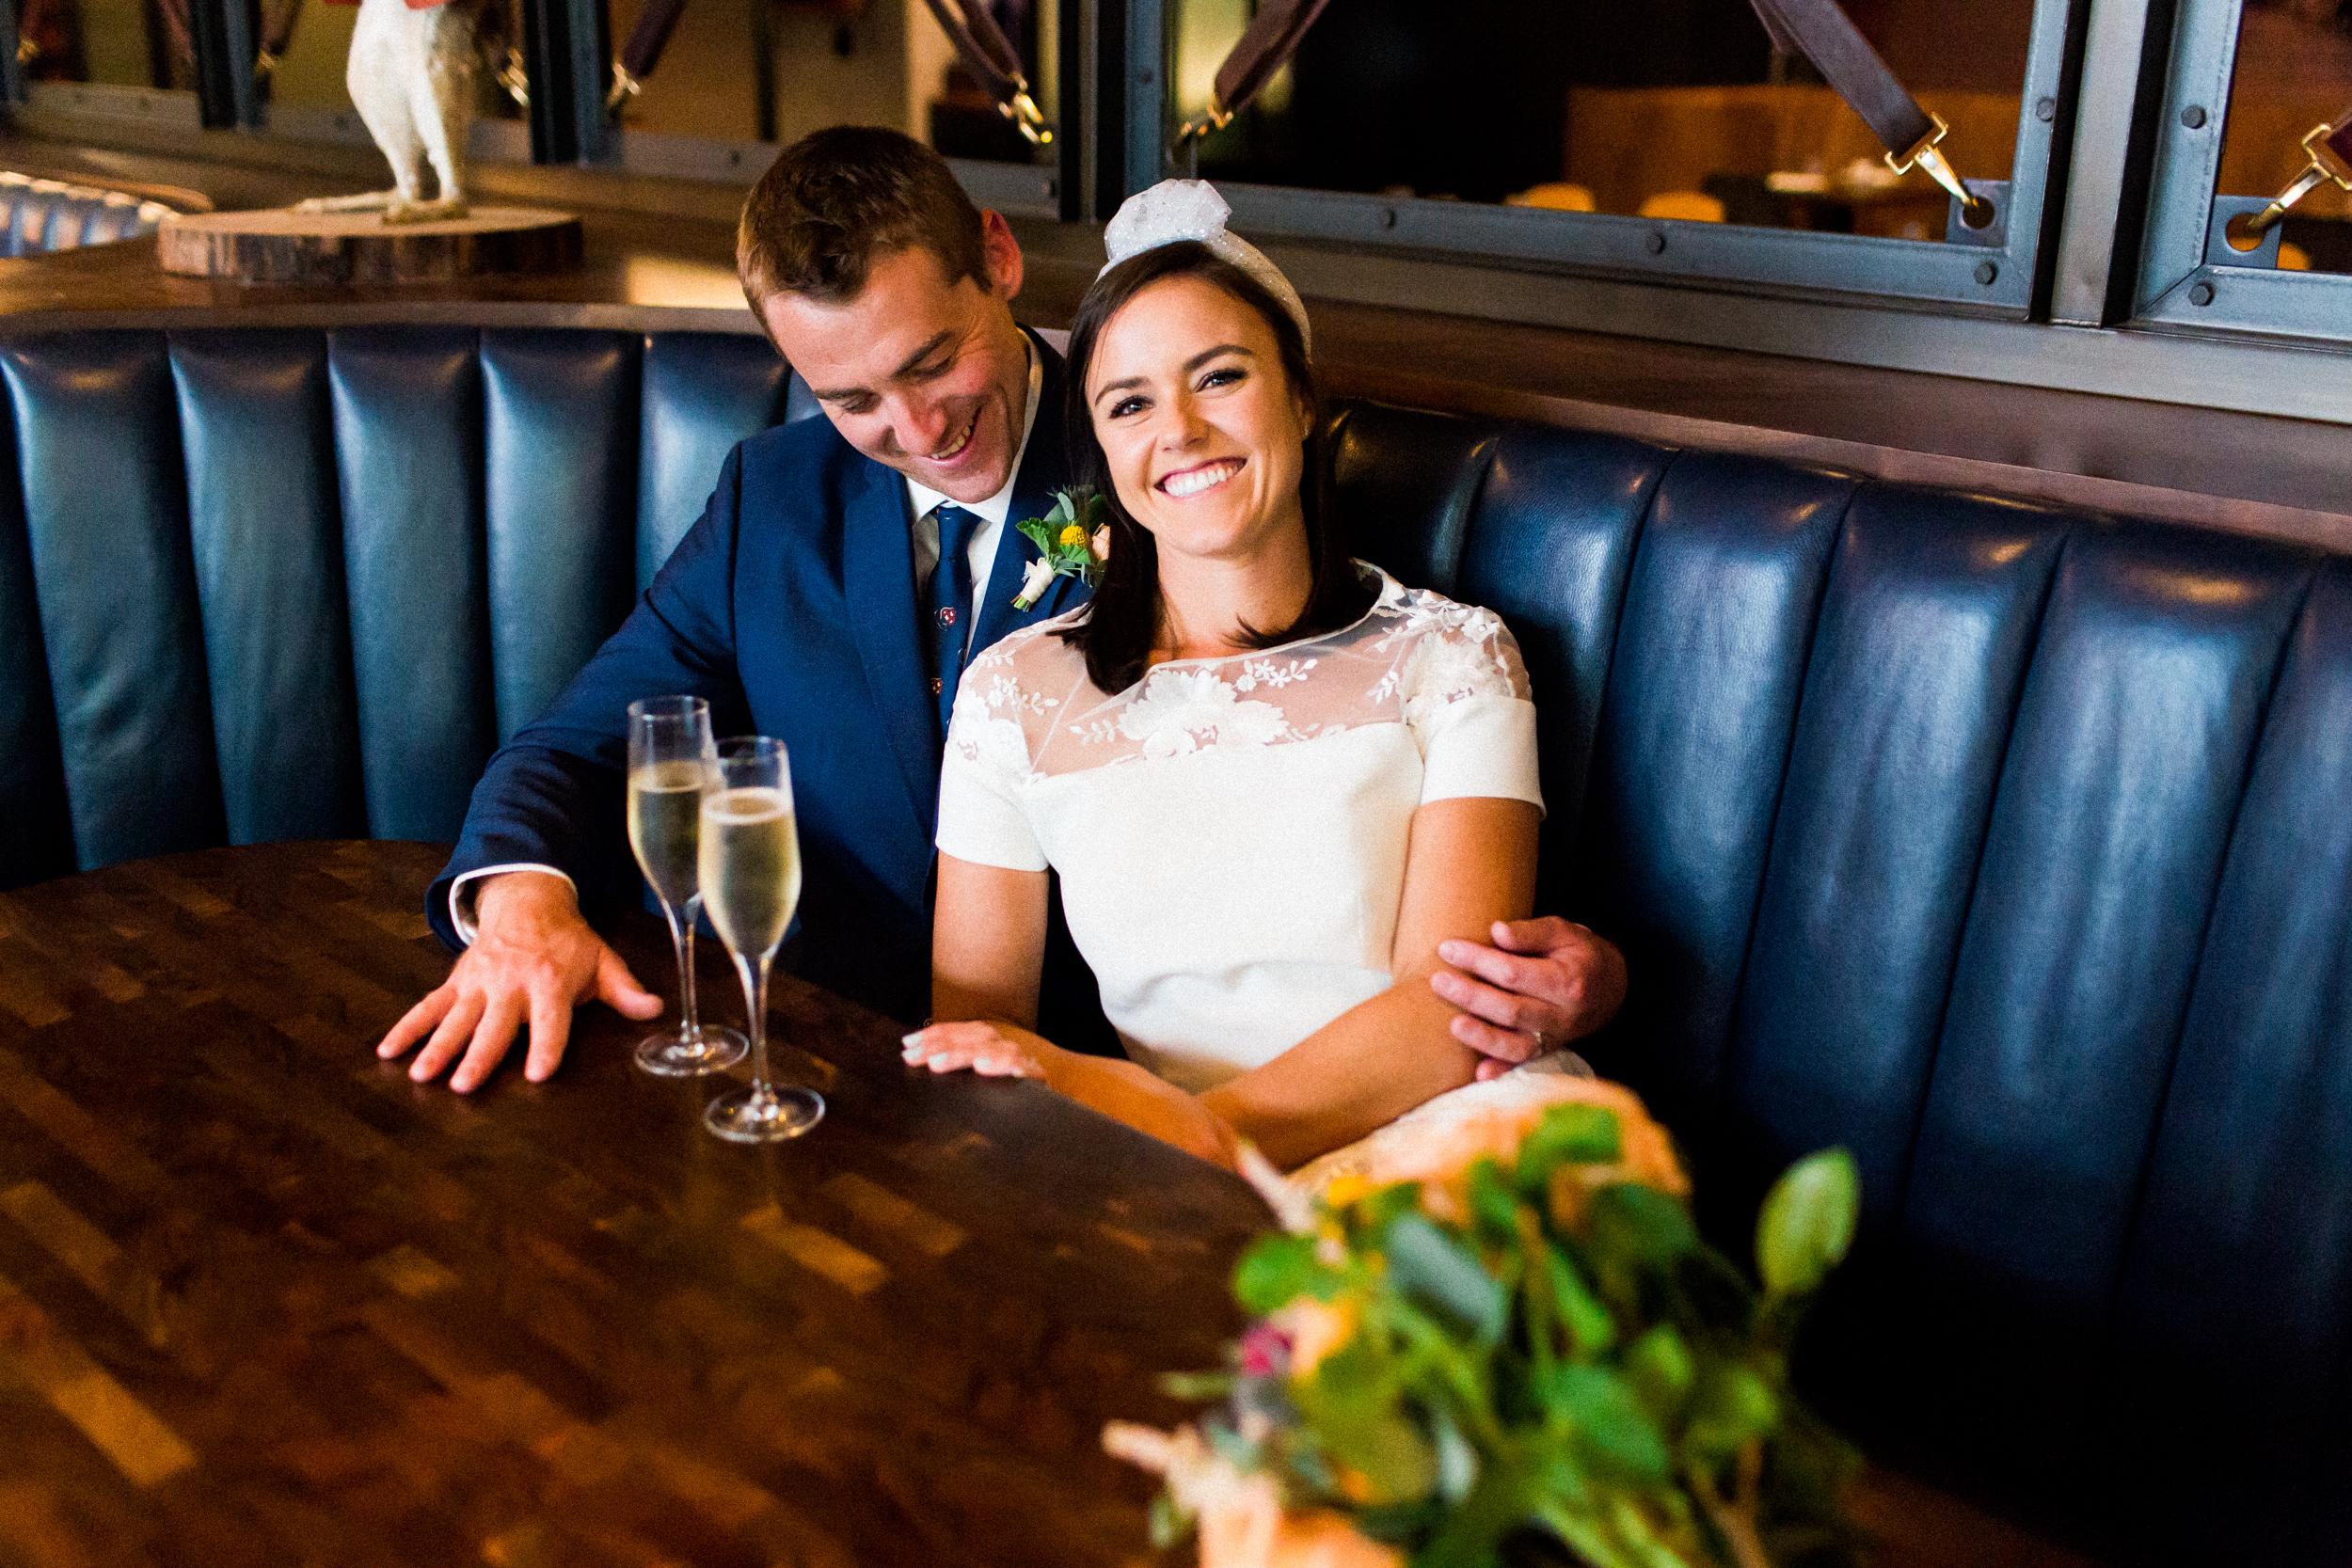 jack_rabbit_bar_portland_elopement_wedding_004